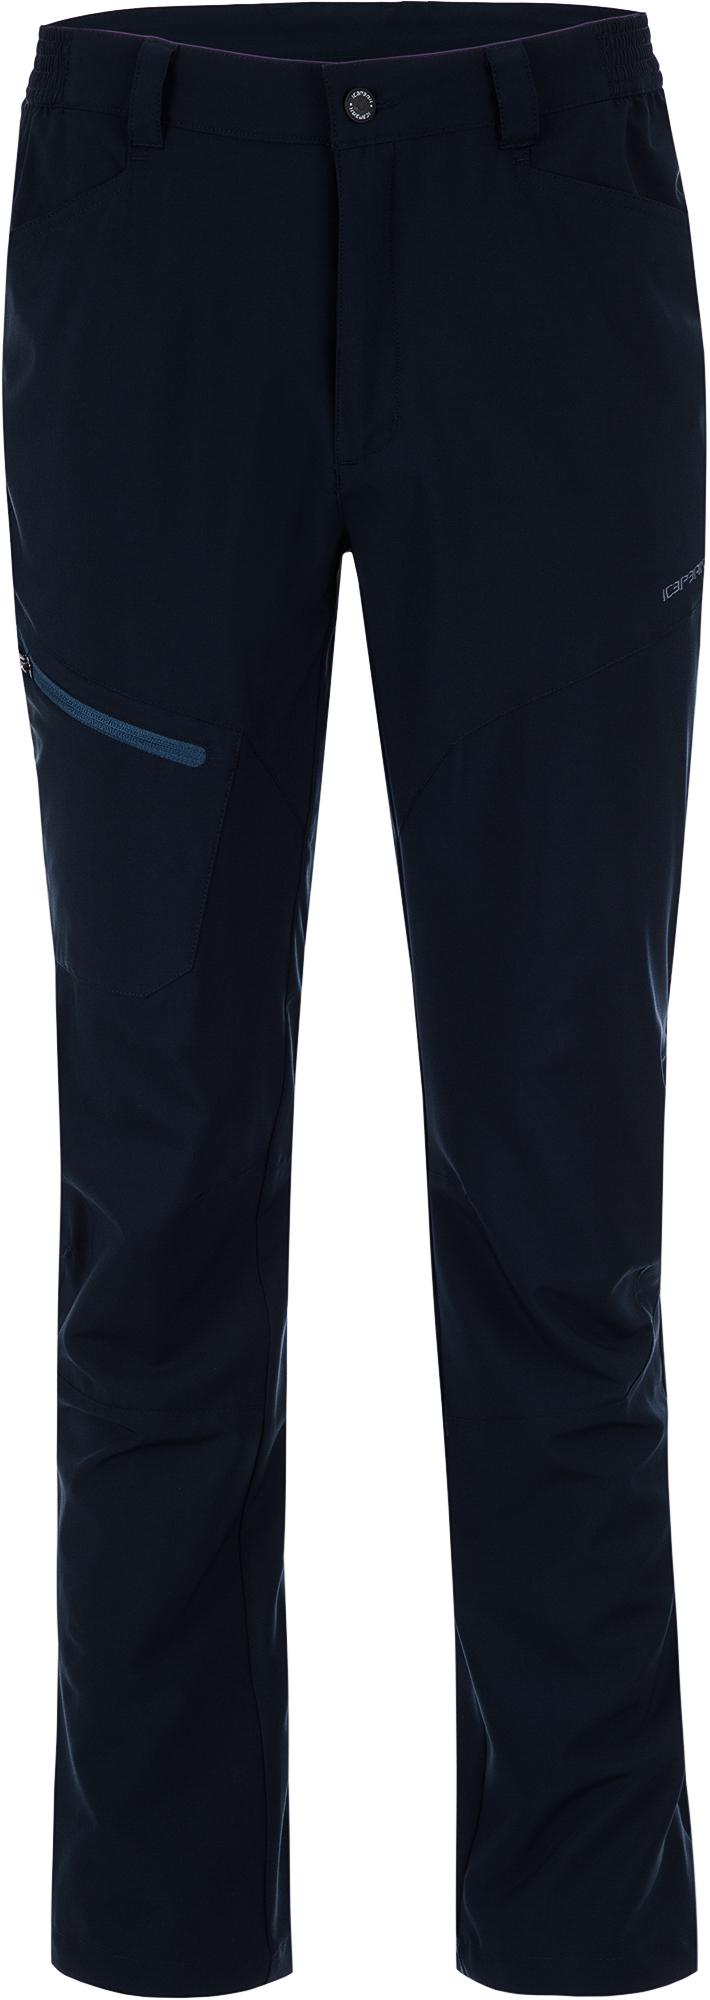 IcePeak Брюки мужские IcePeak Sky, размер 54 брюки мужские sela цвет темно серый меланж pk 2415 012 8310 размер xxl 54